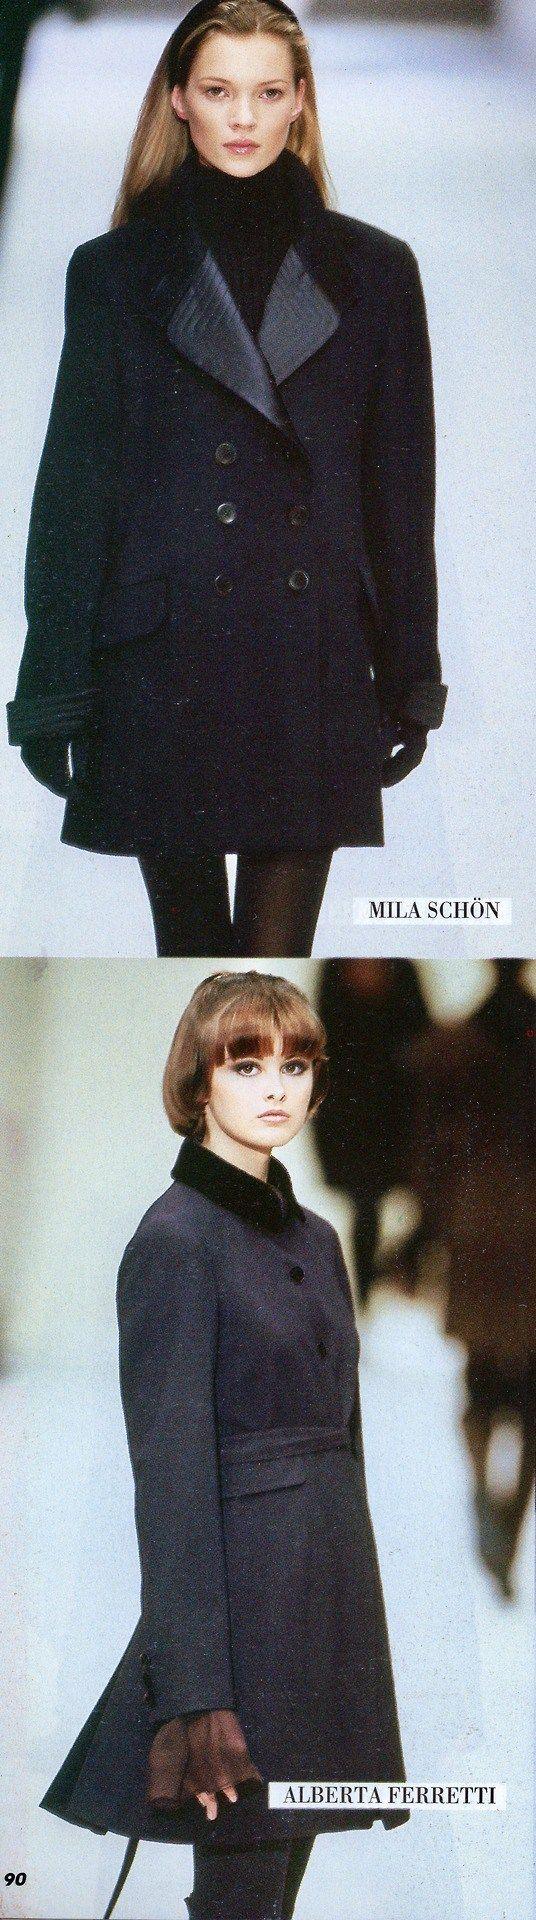 kate moss – Page 2 – Vintage Fashion